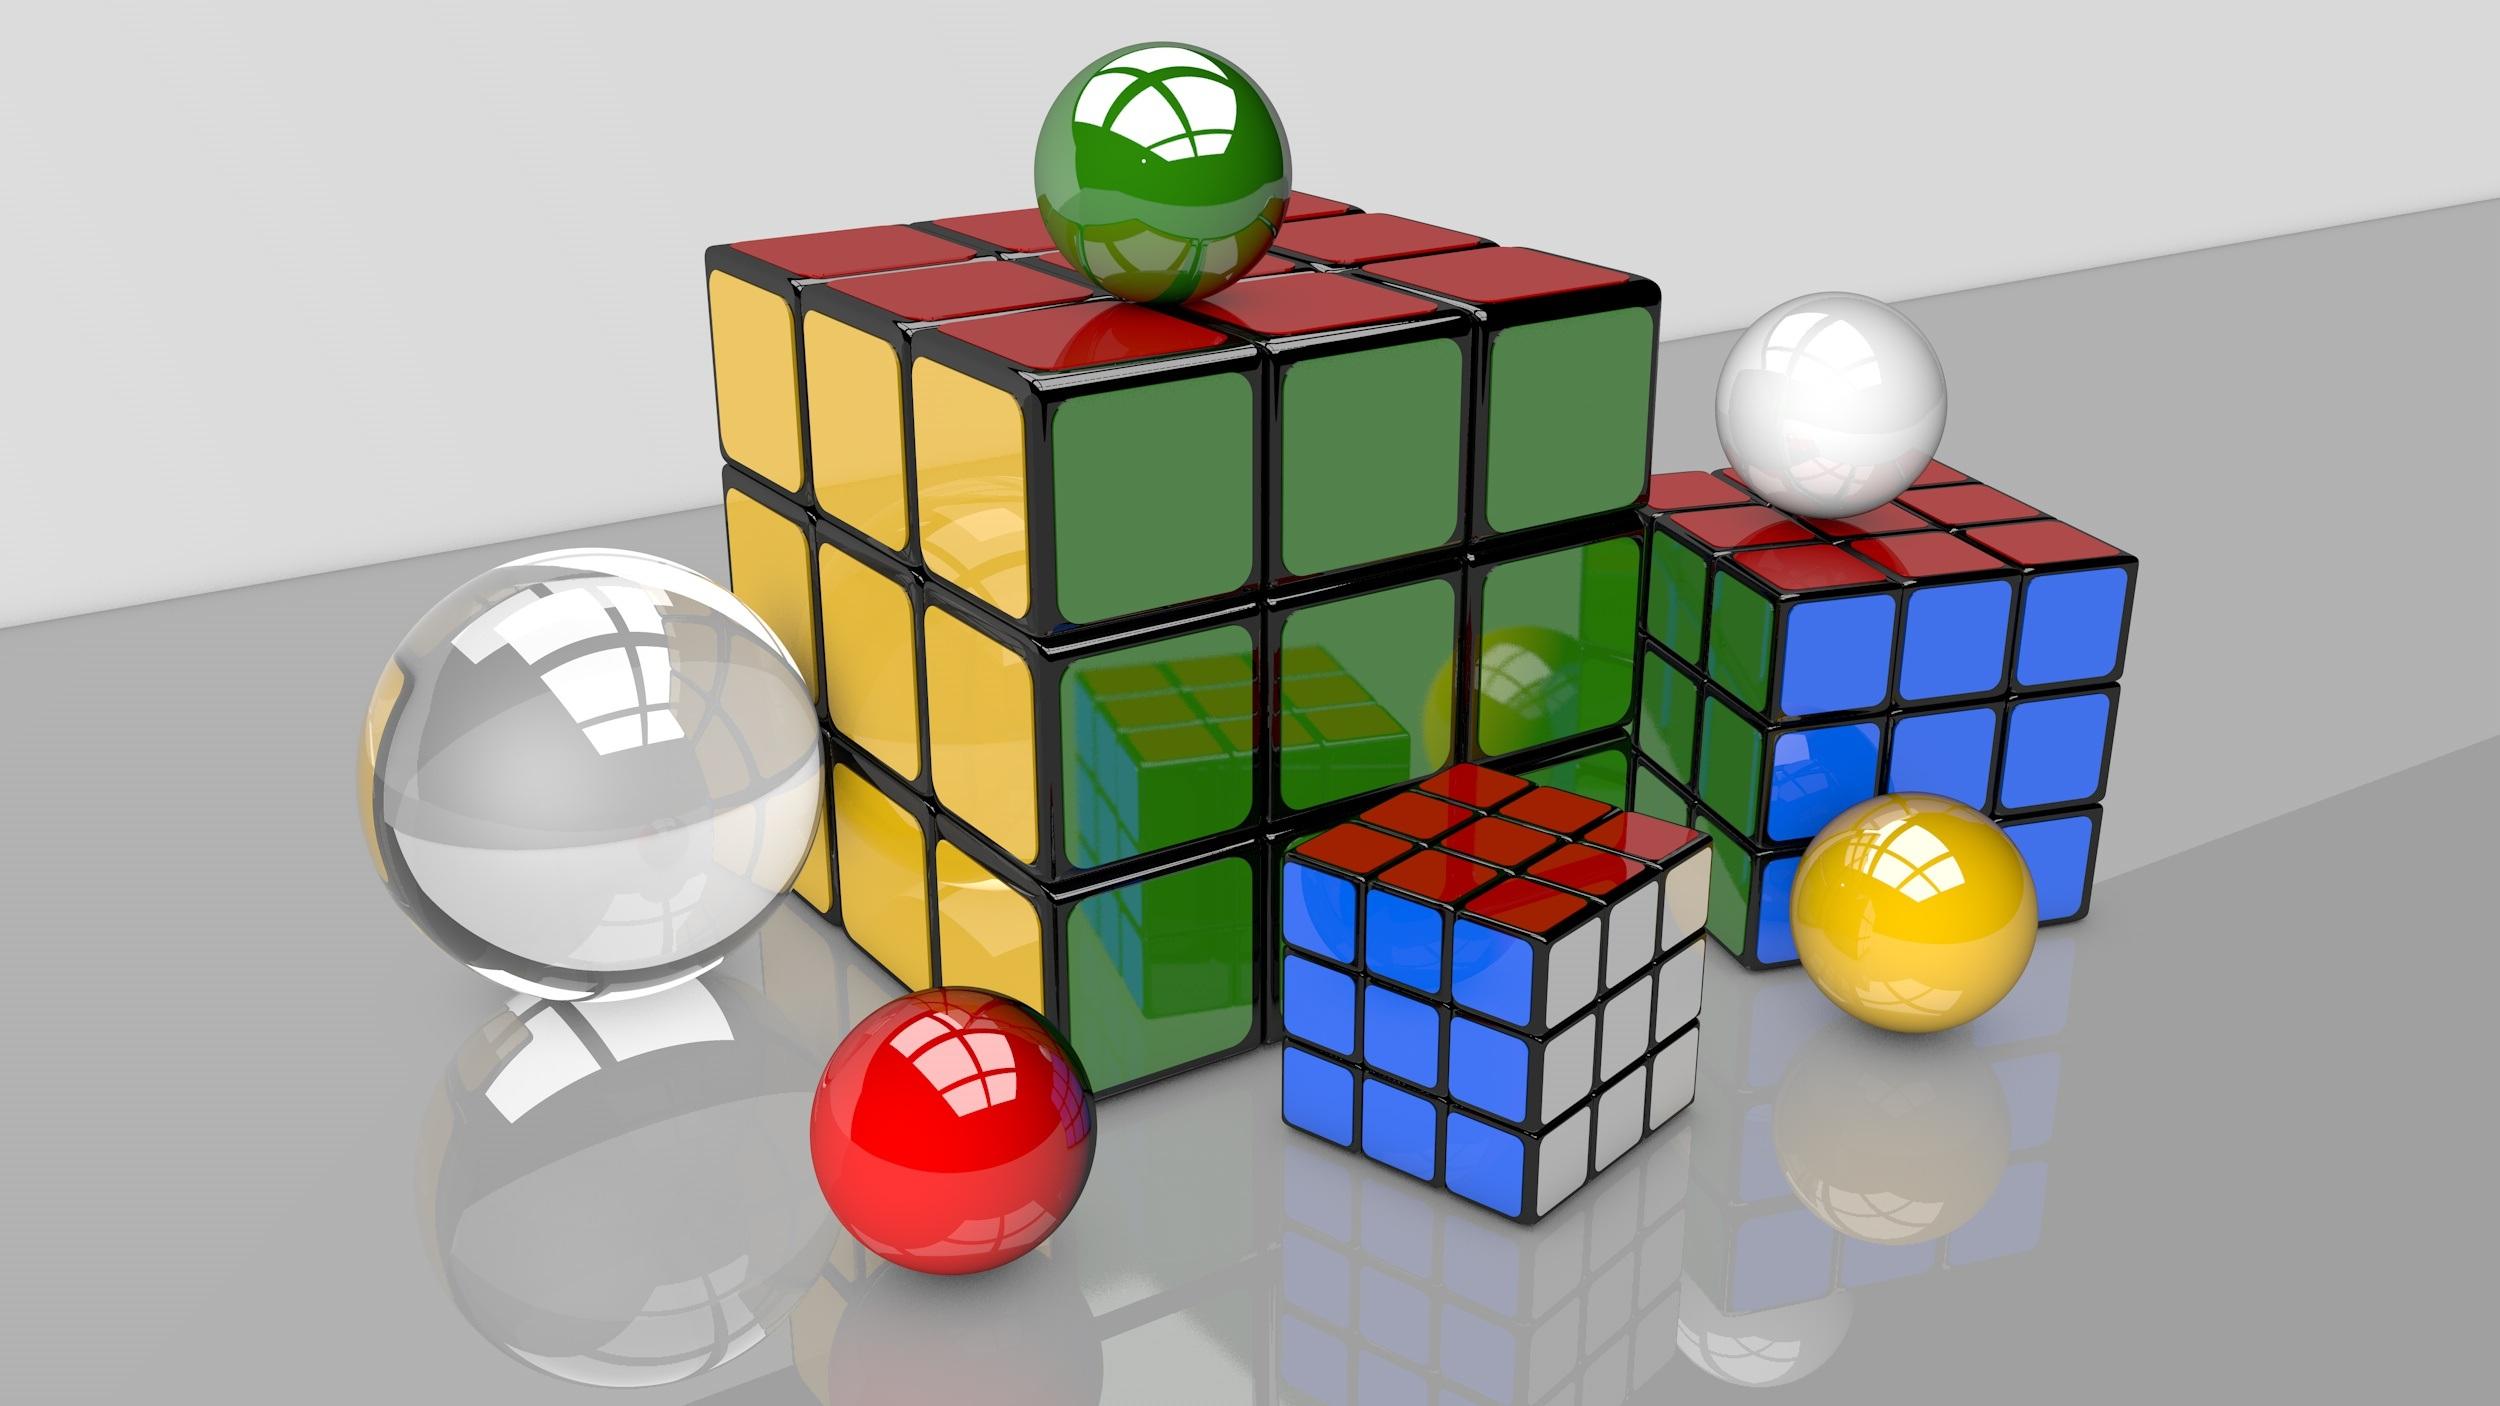 Wallpaper Illustration 3d Toy Balls Ball Rubiks Cube